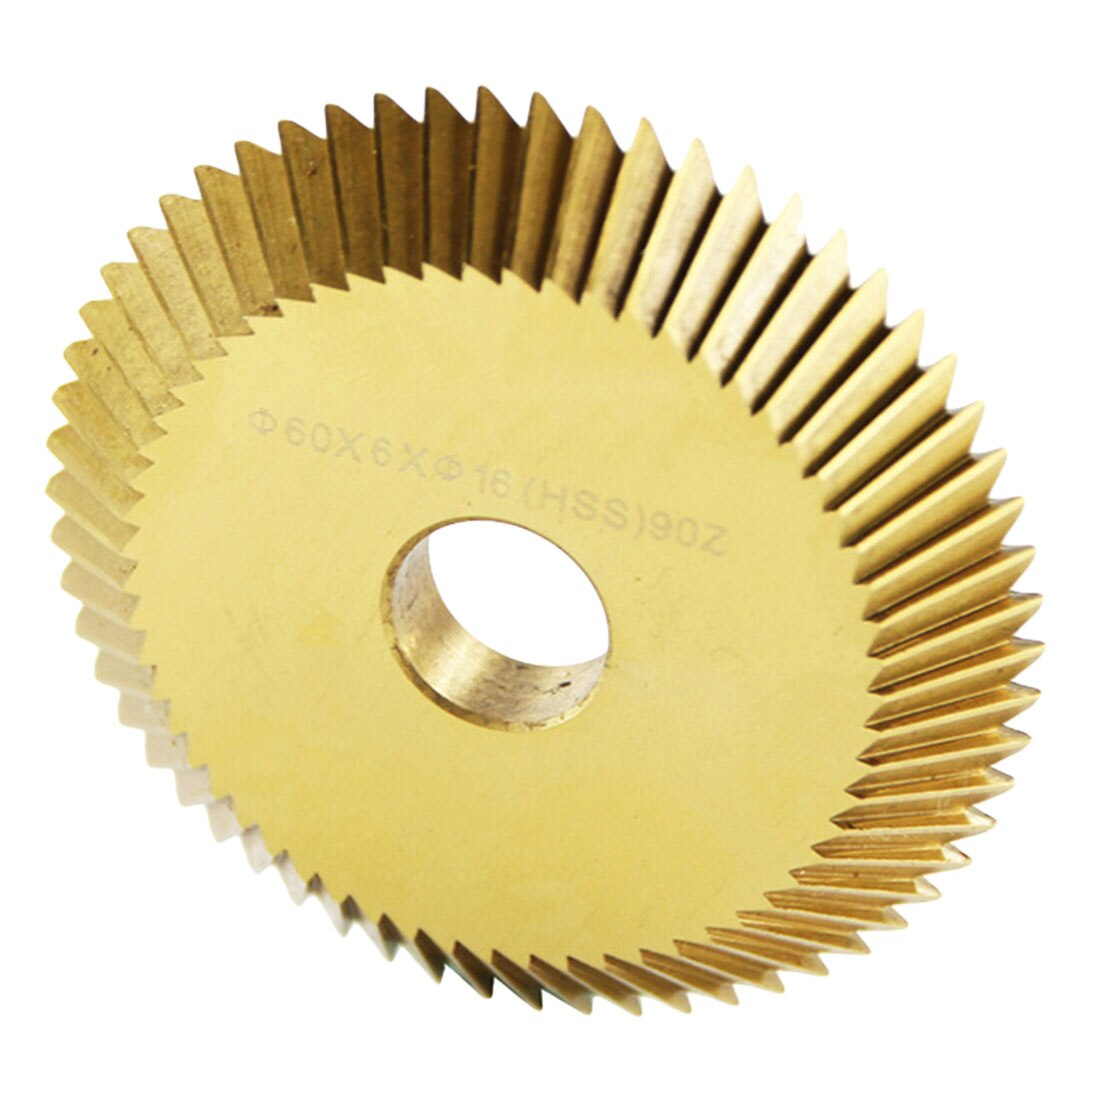 Key Machine Disk Cutter HSS Cutting Saw Blade 90T Single-sided Tooth for Cutting Machine Titanium Plating 60*6*16mm